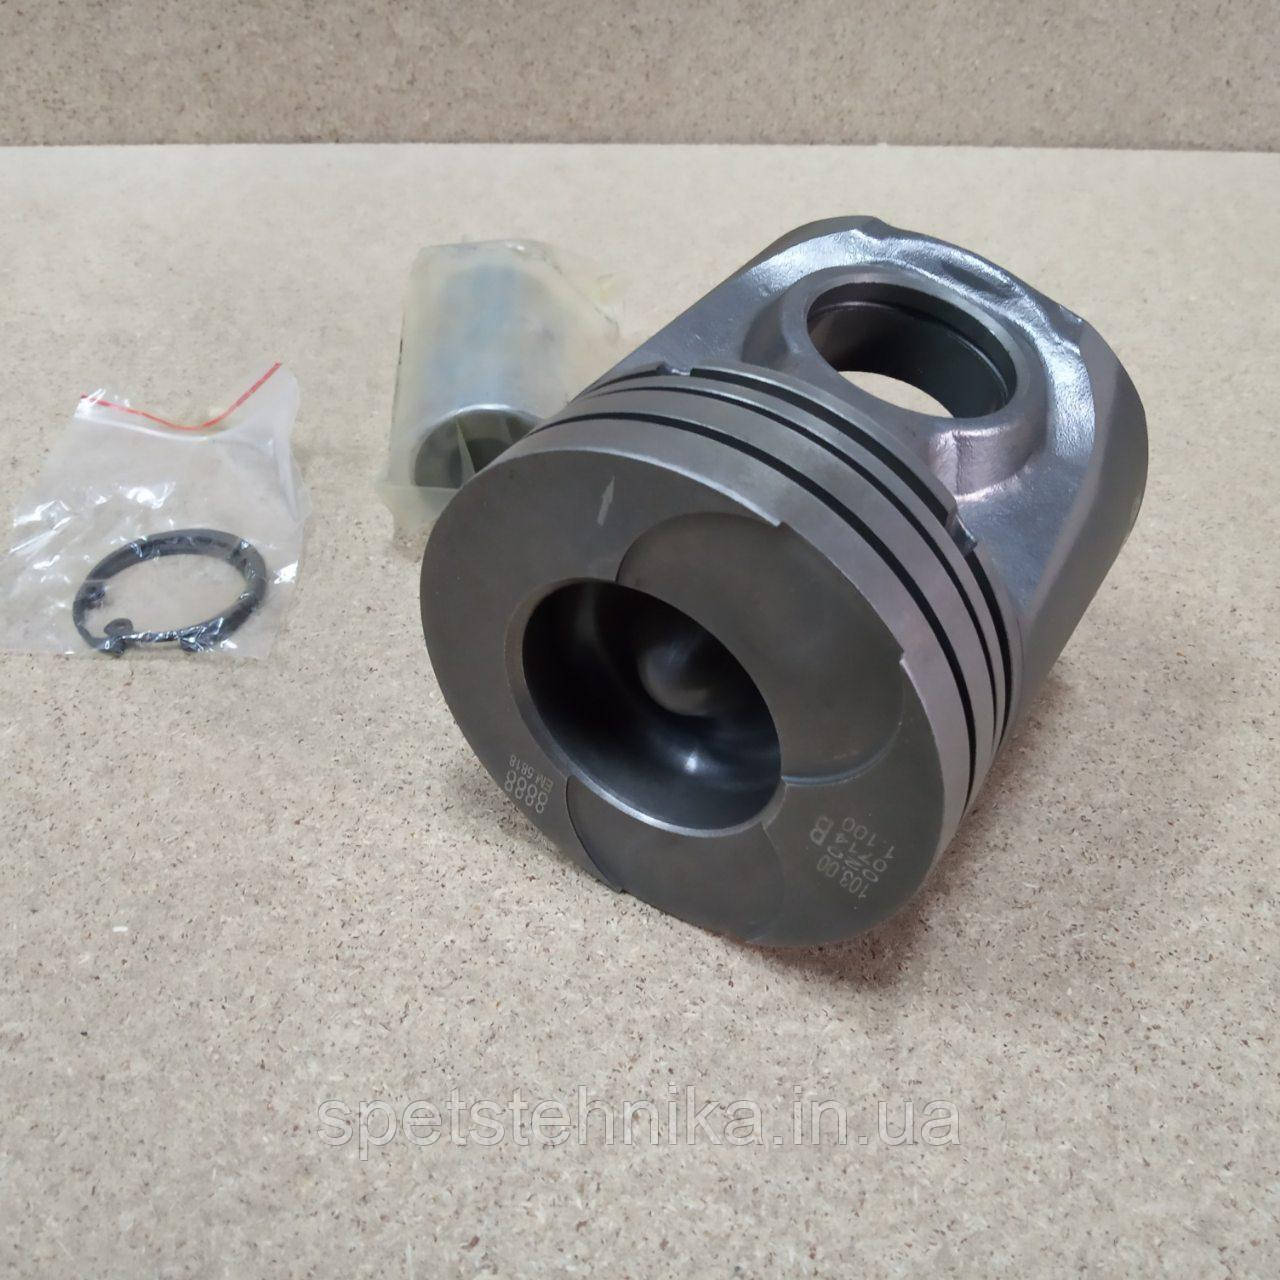 U5LP0058B поршень (0.5) мм